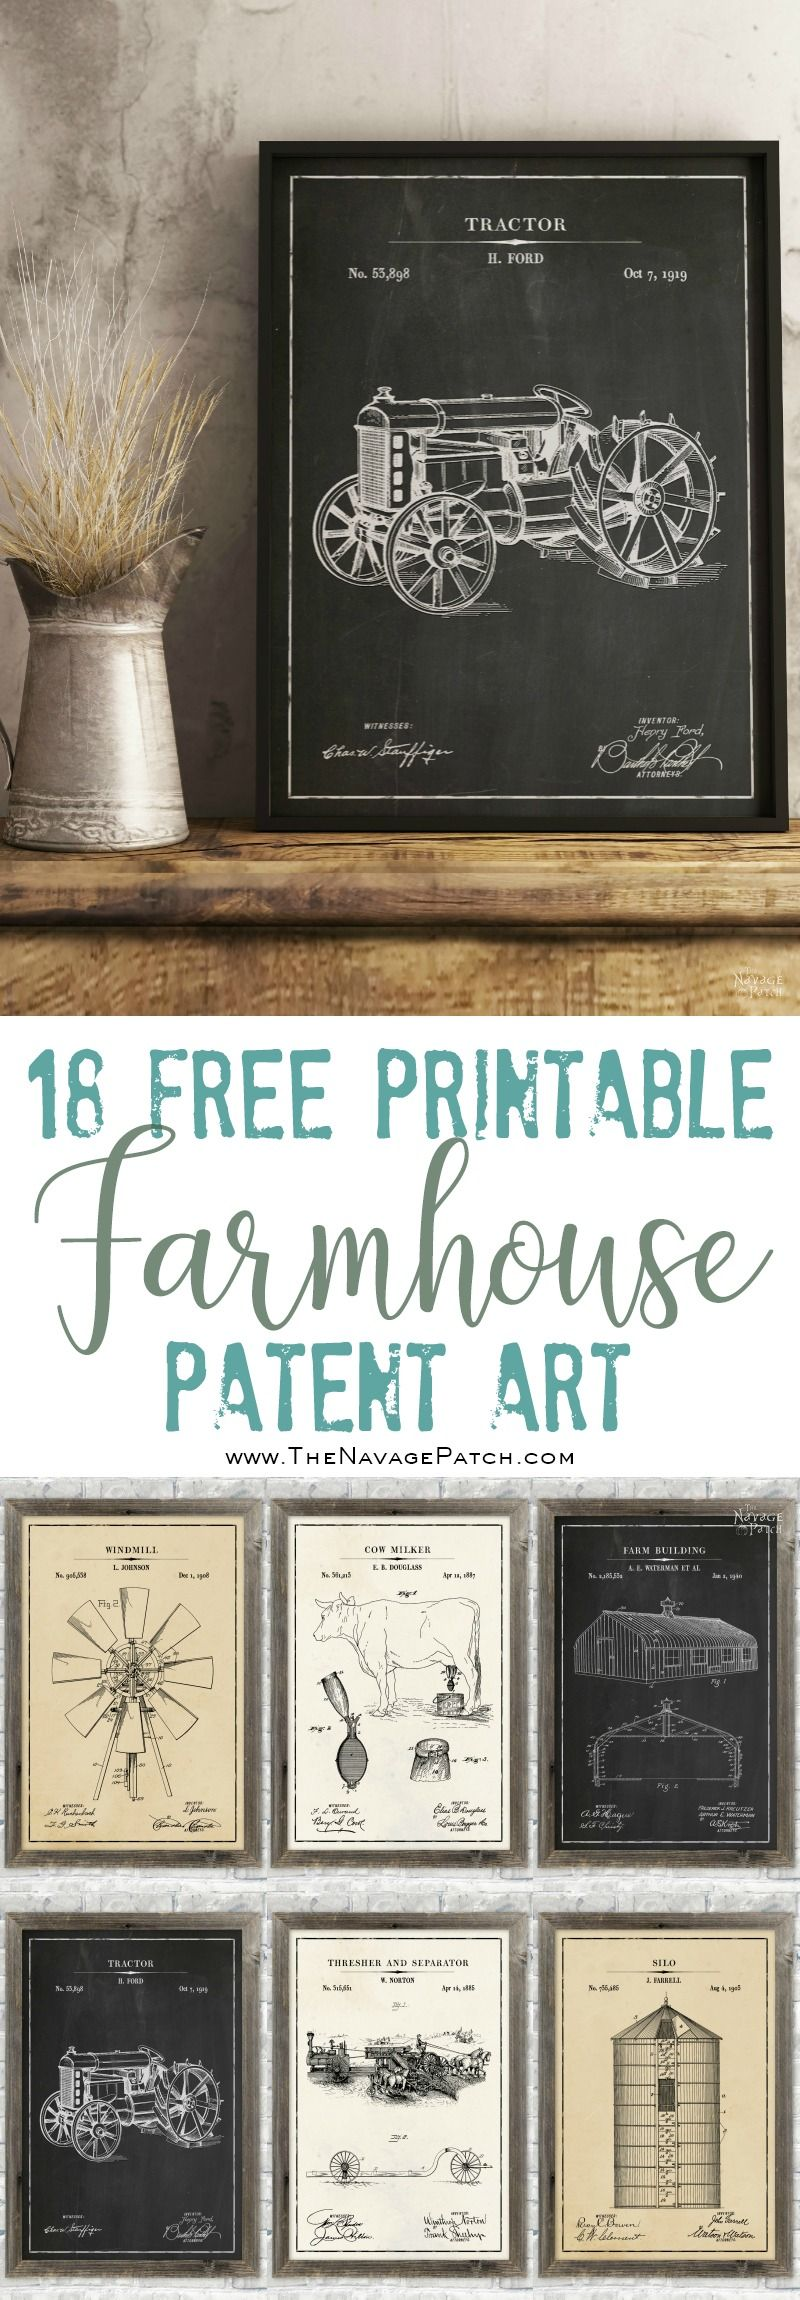 Farmhouse Patent Art pinterest image